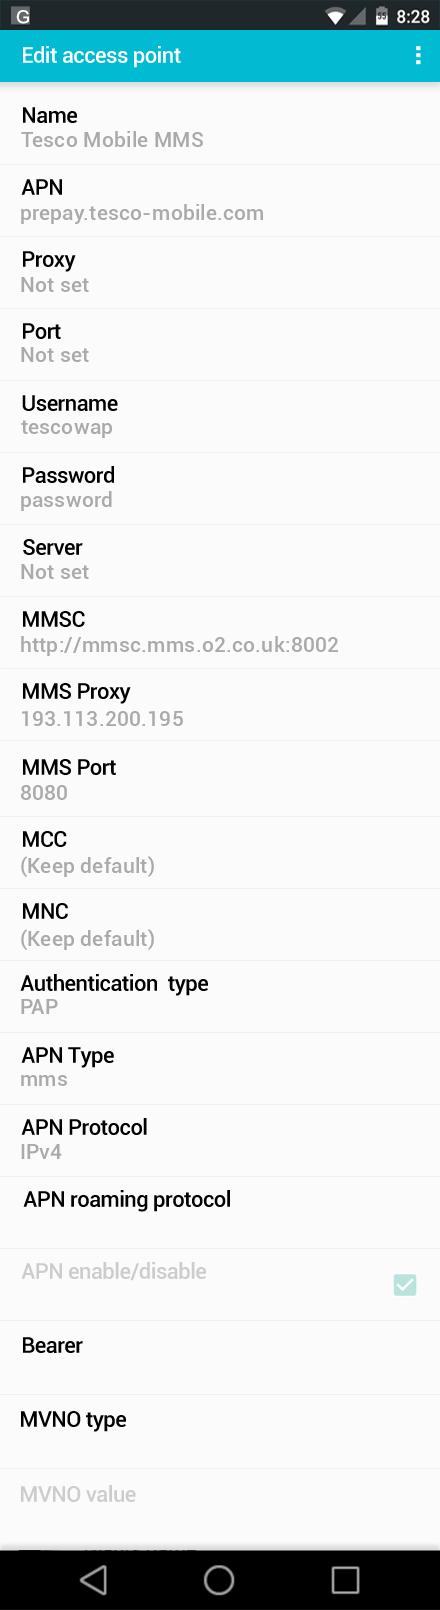 Tesco Mobile MMS APN settings for Android screenshot